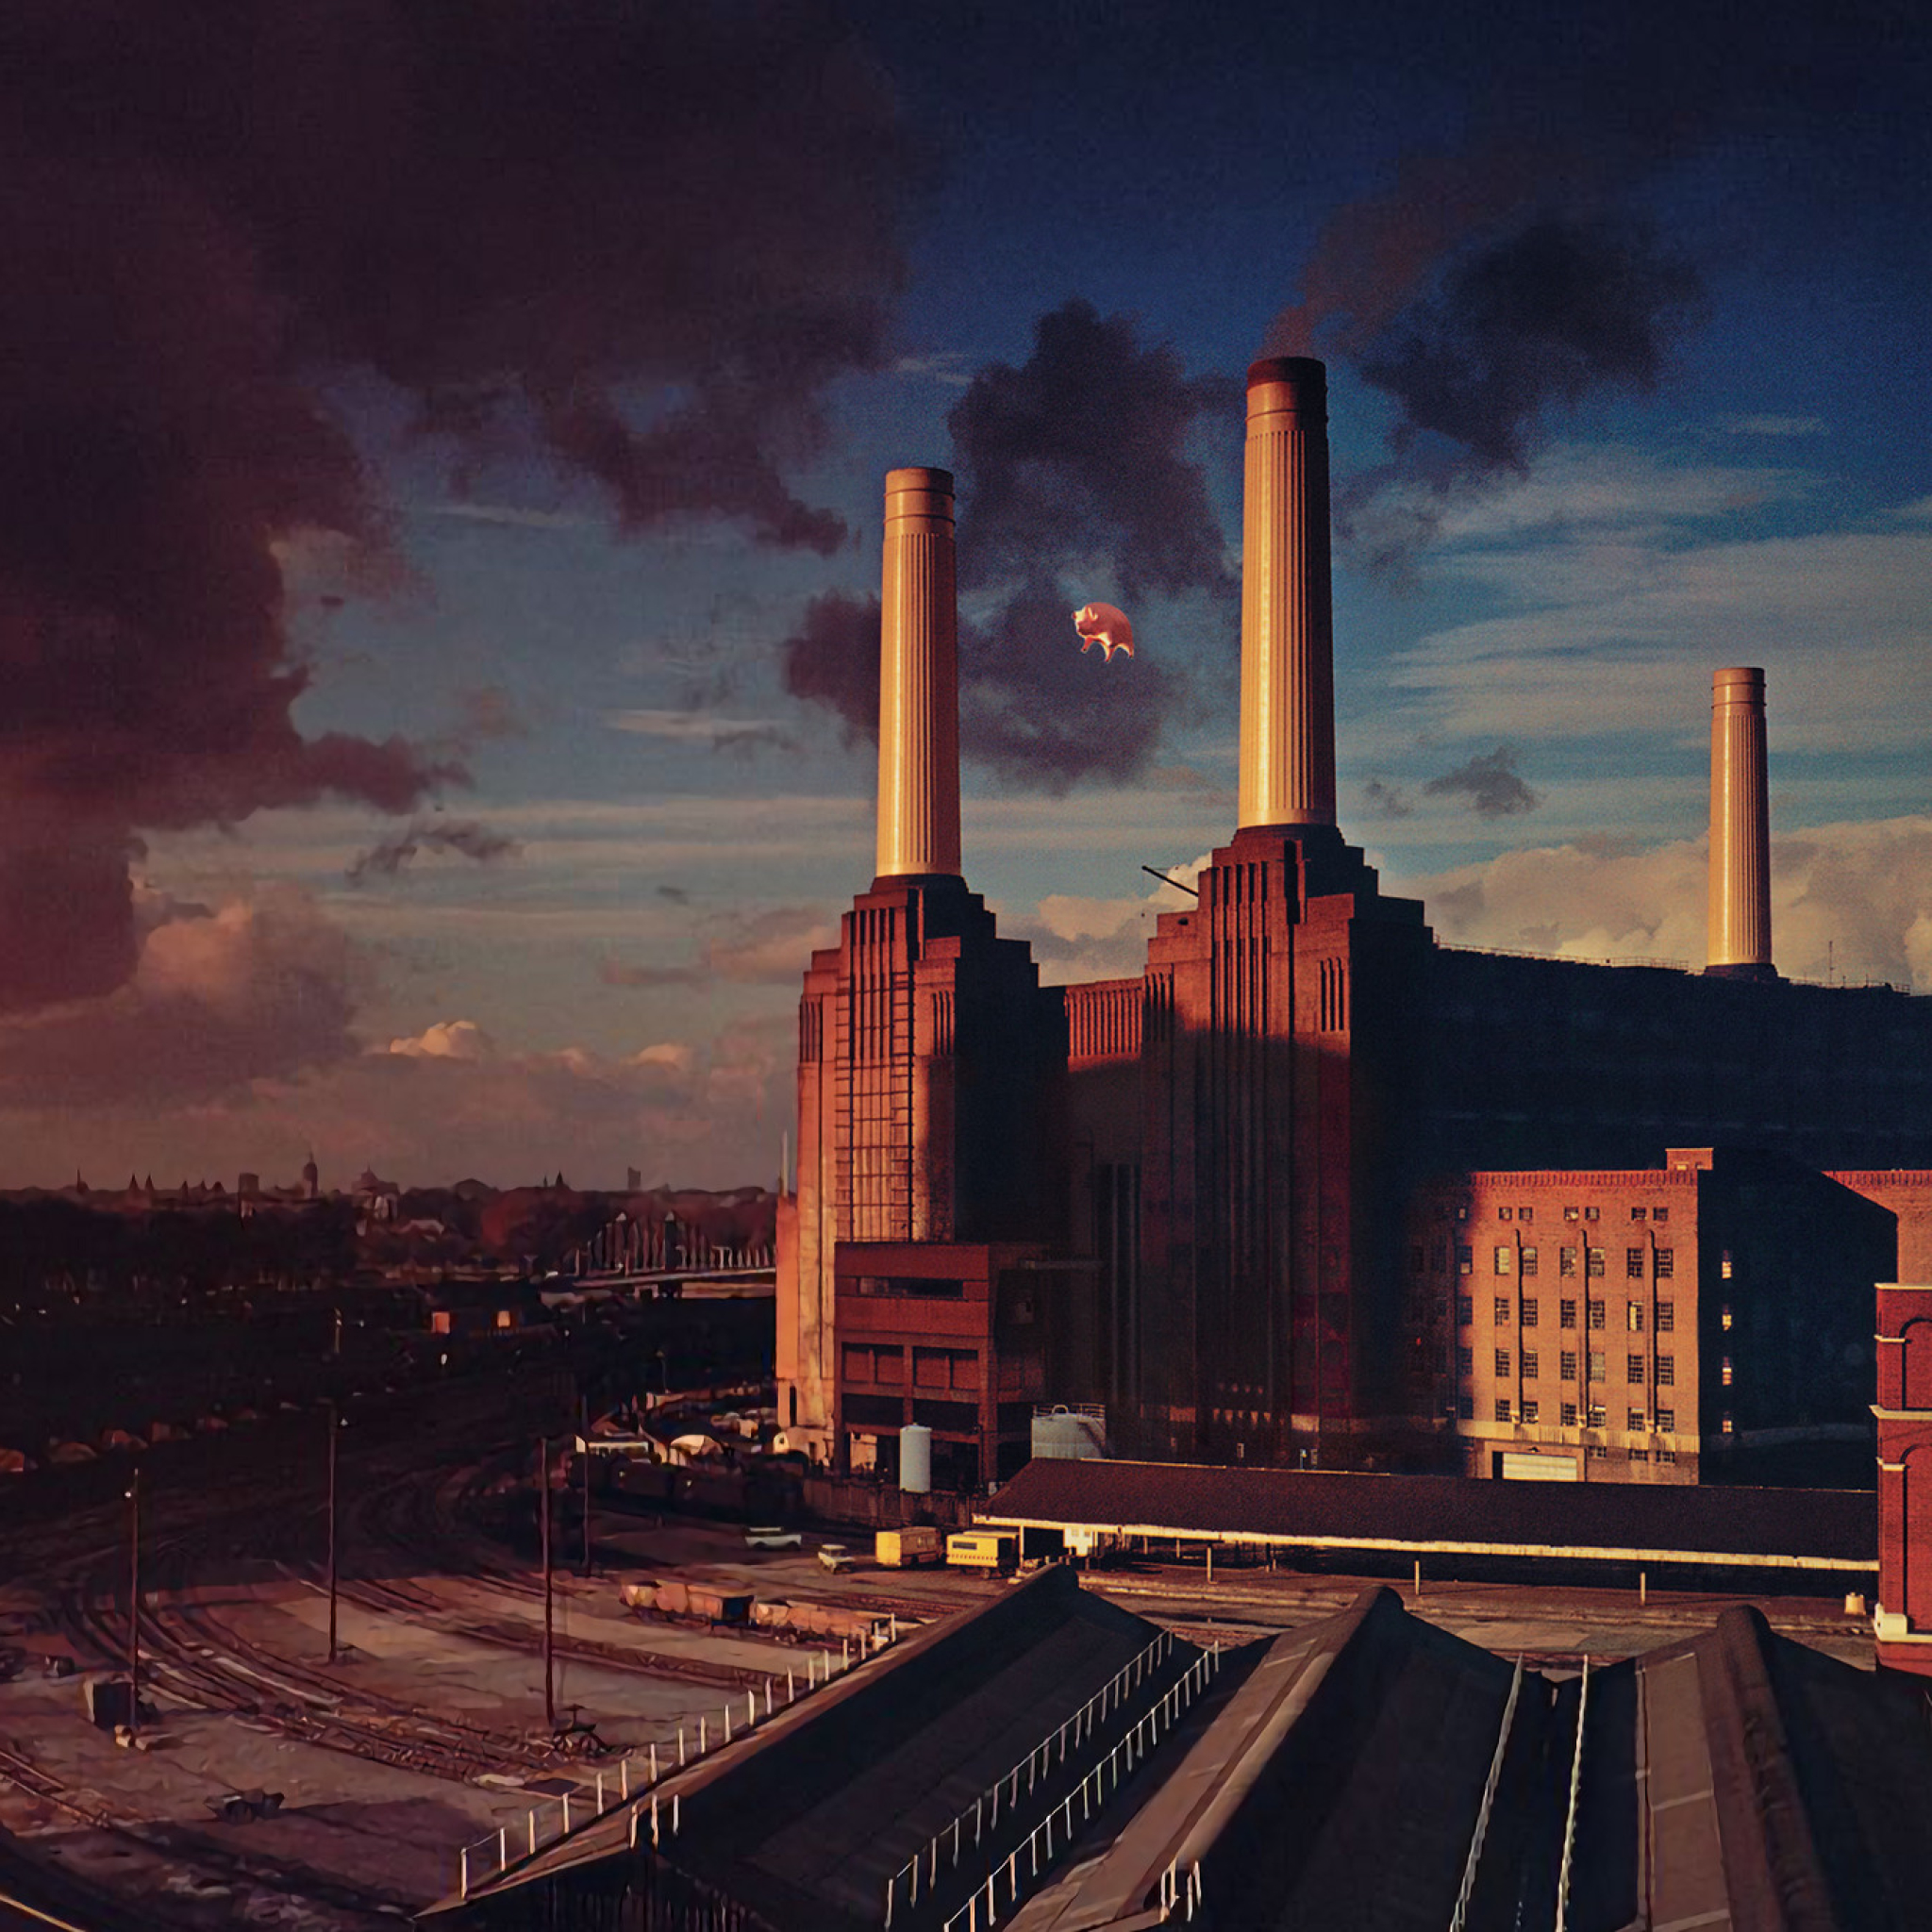 2048x2048 Pink Floyd Animals Album Cover Ipad Air Wallpaper Hd